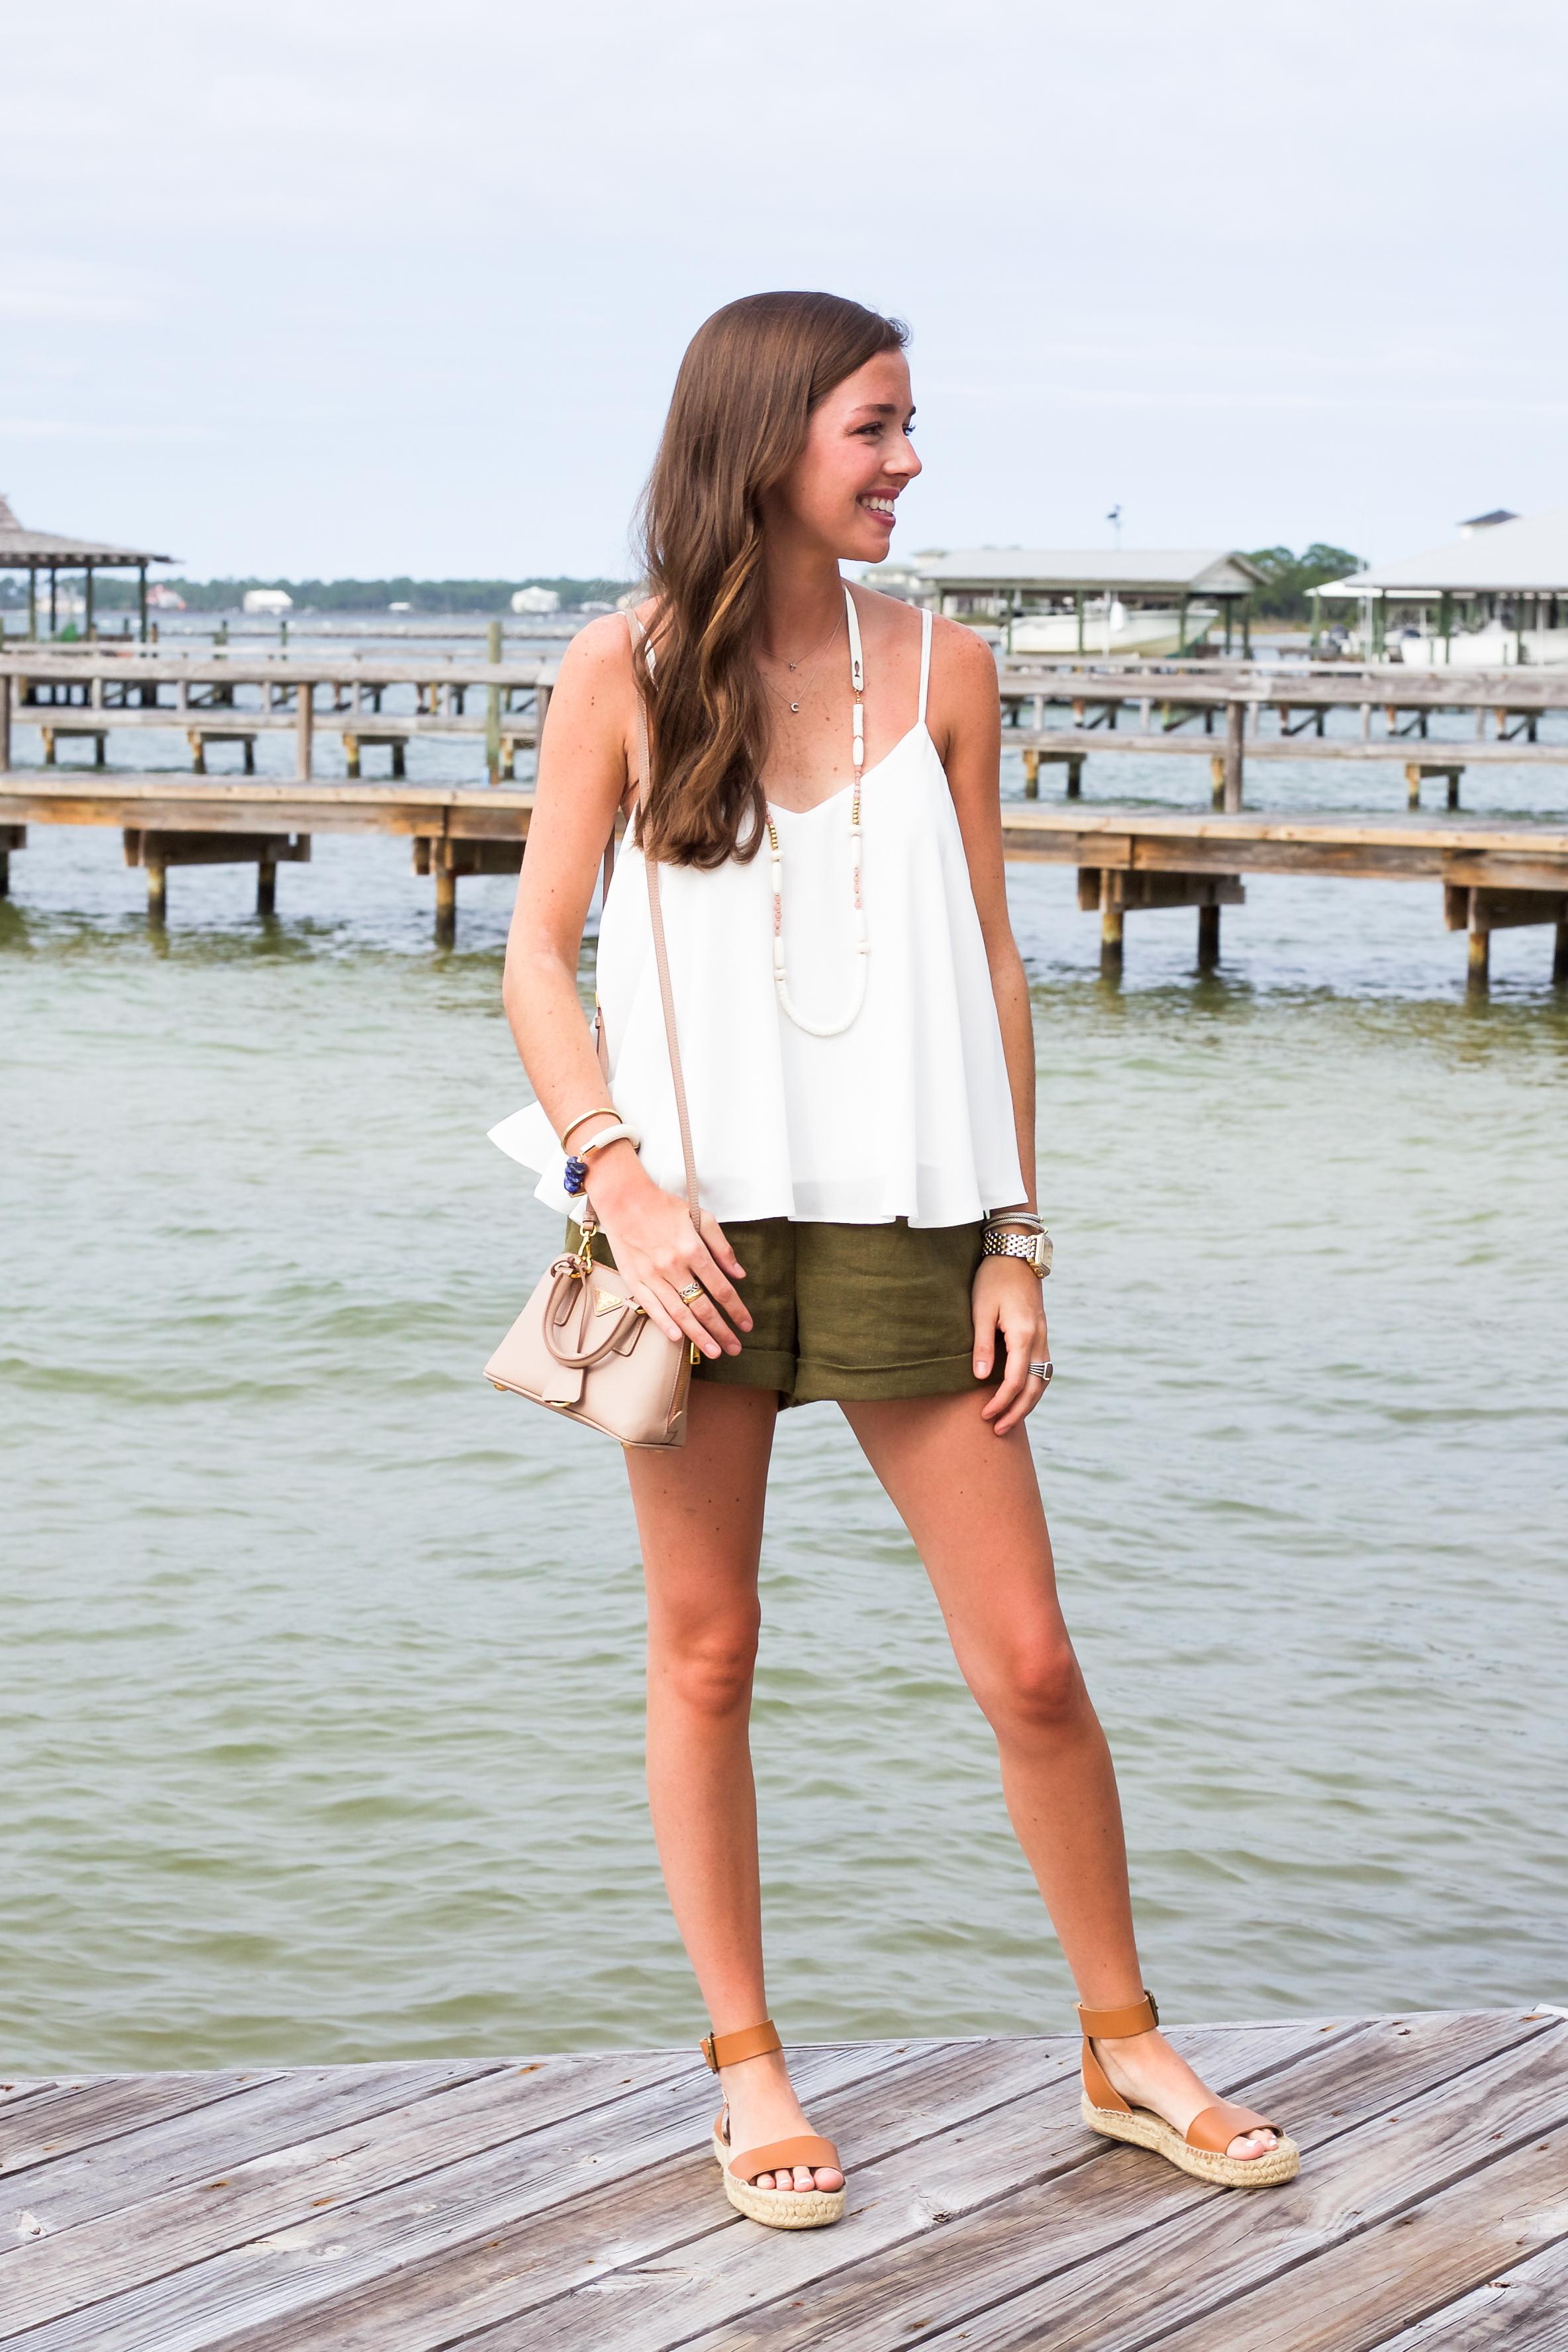 fashion blogger lcb style beach soludos topshop (15 of 21).jpg